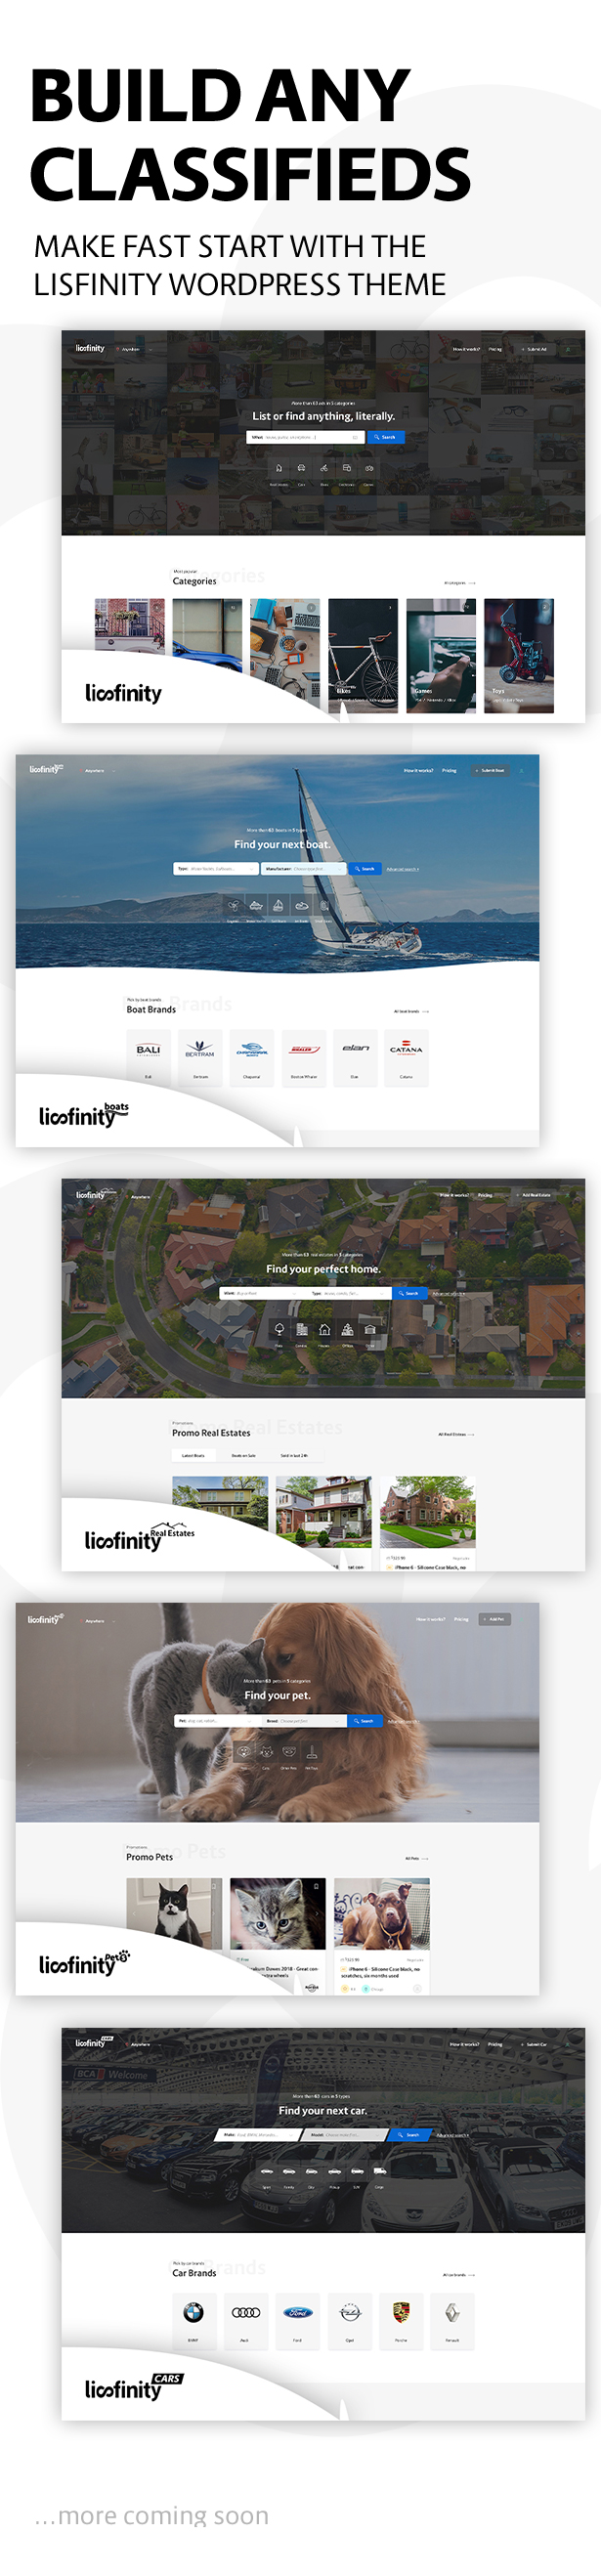 Lisfinity - Kleinanzeigen WordPress Theme - 8